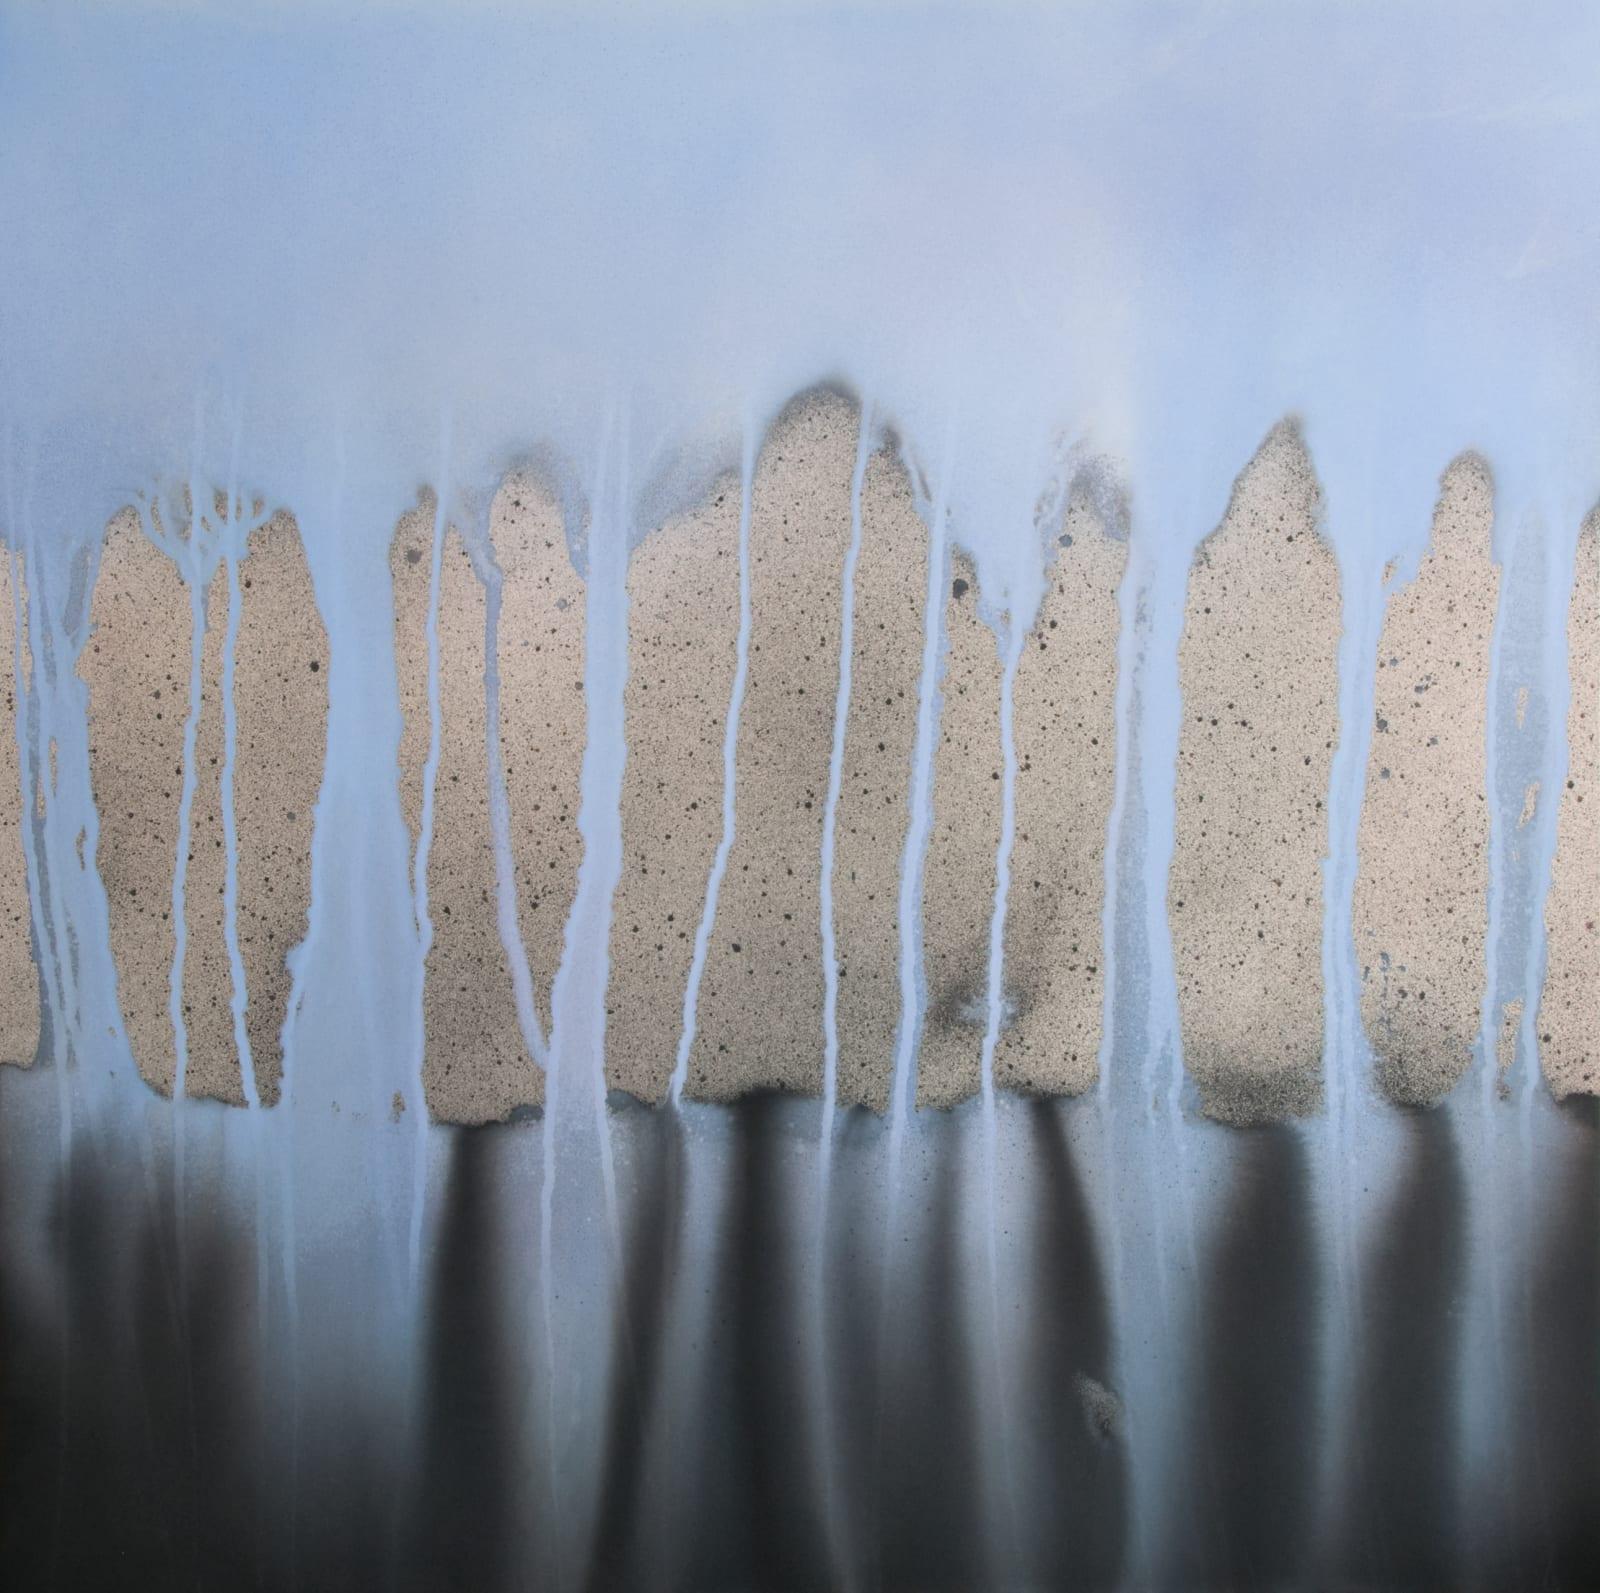 Ari Lankin, Essence, 2015